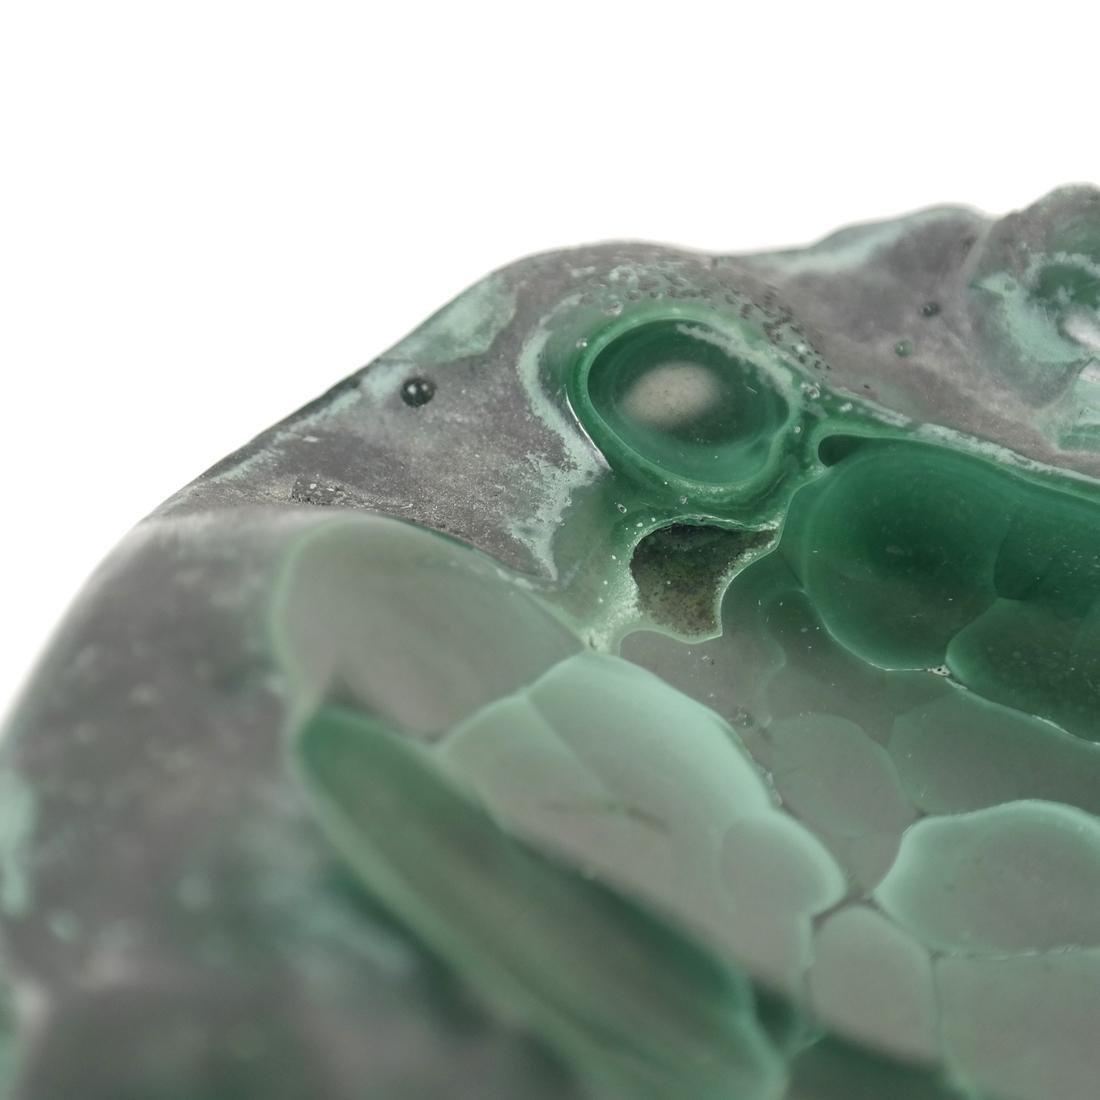 6 Pieces Polished Malachite - 10